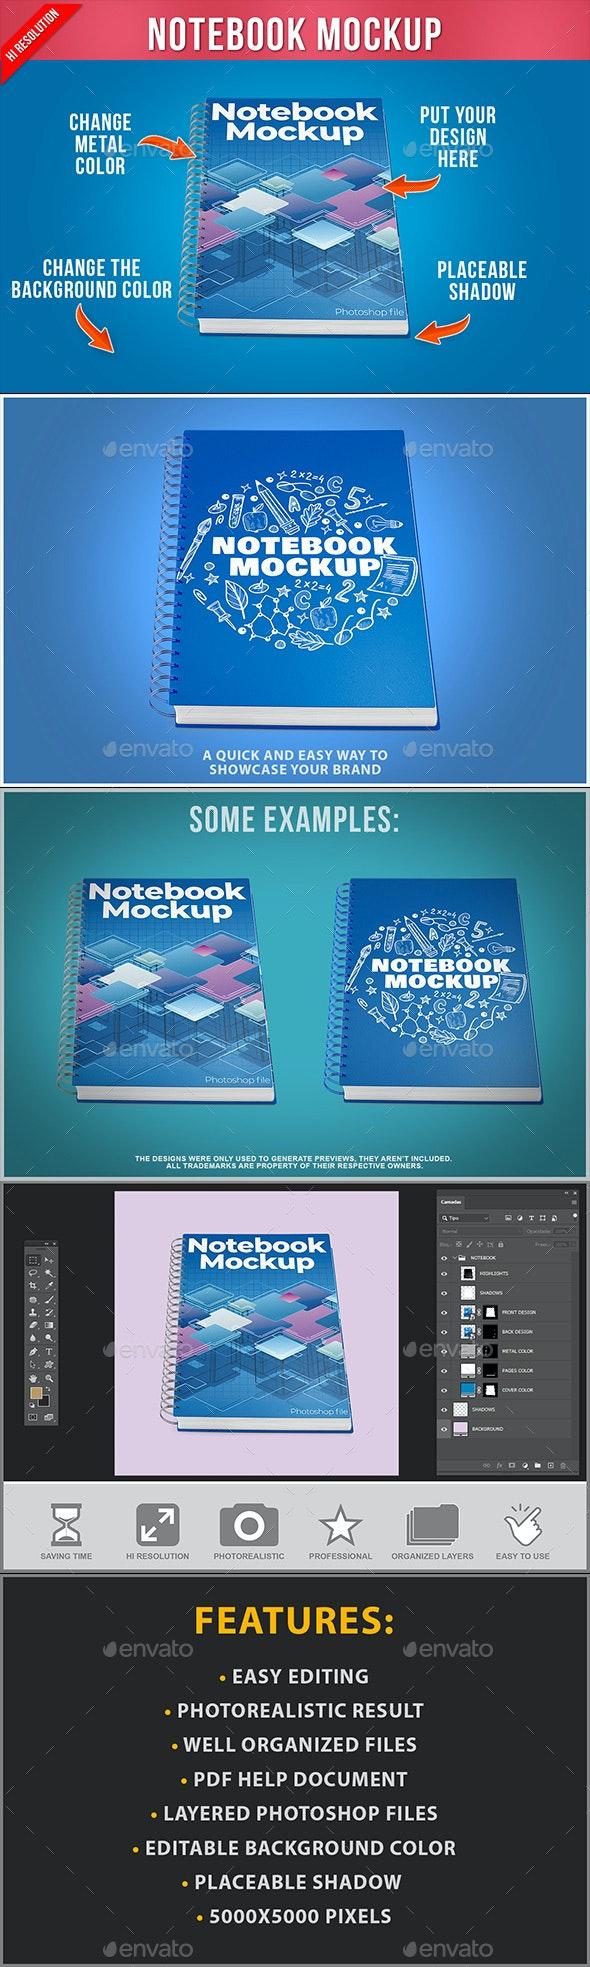 Notebook Mockup - Product Mock-Ups Graphics